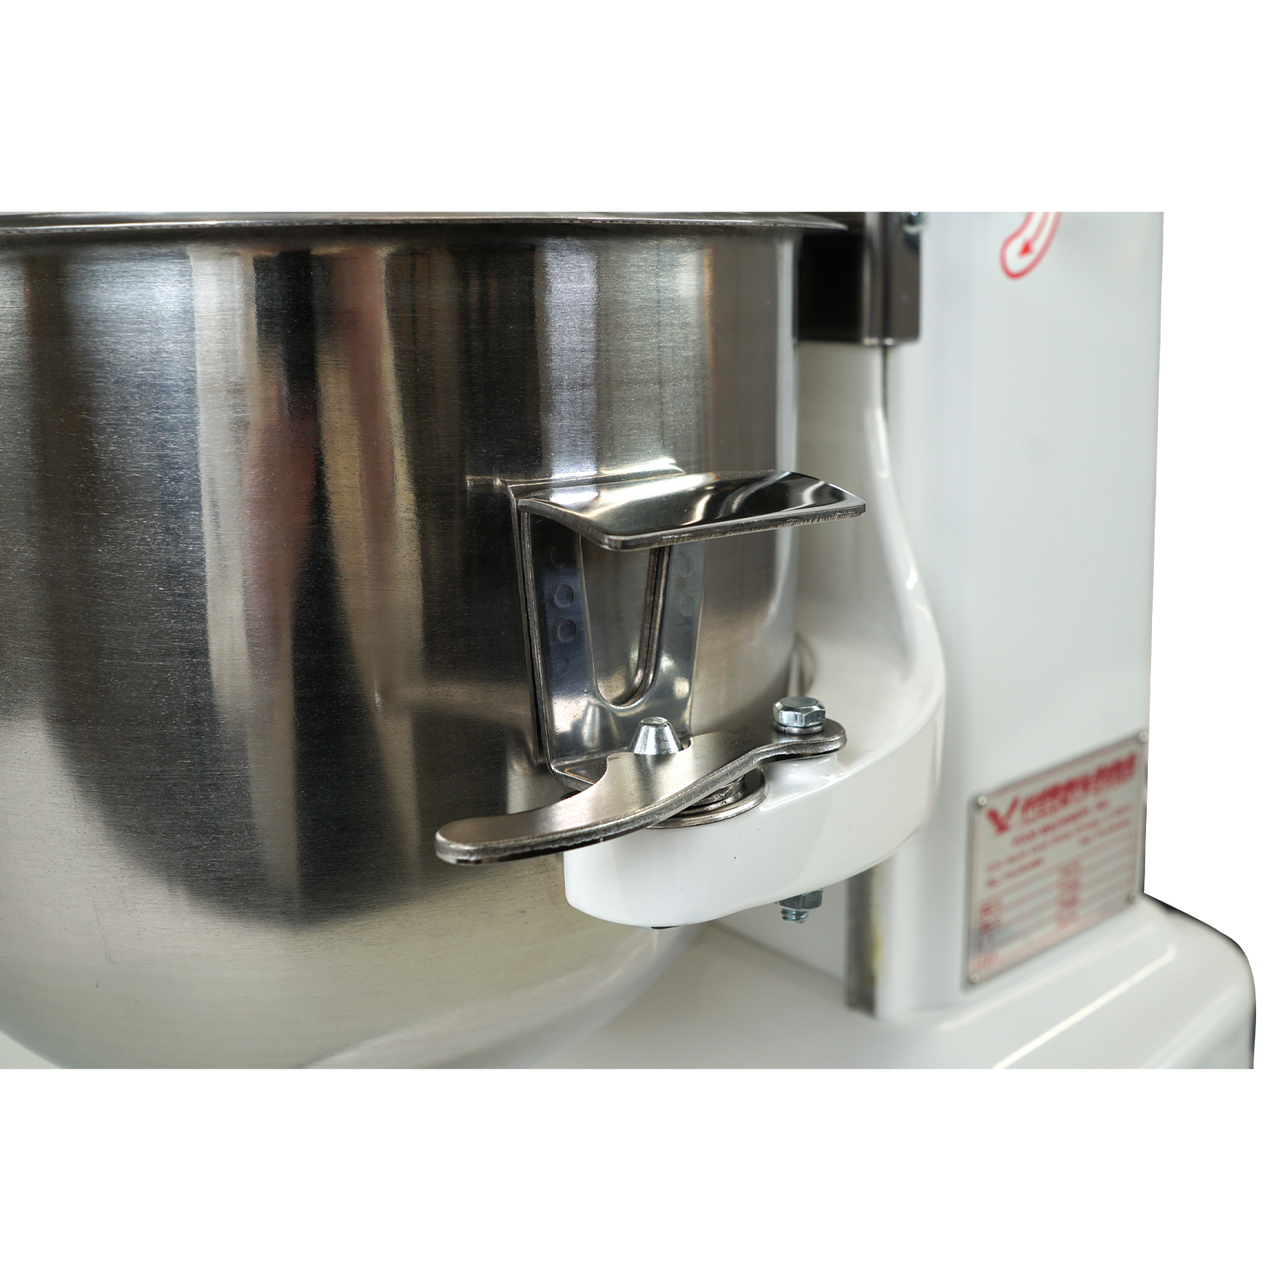 Bowl Lock, AE-10DCA 10 Quart Countertop Planetary Mixer, Commercial Mixer